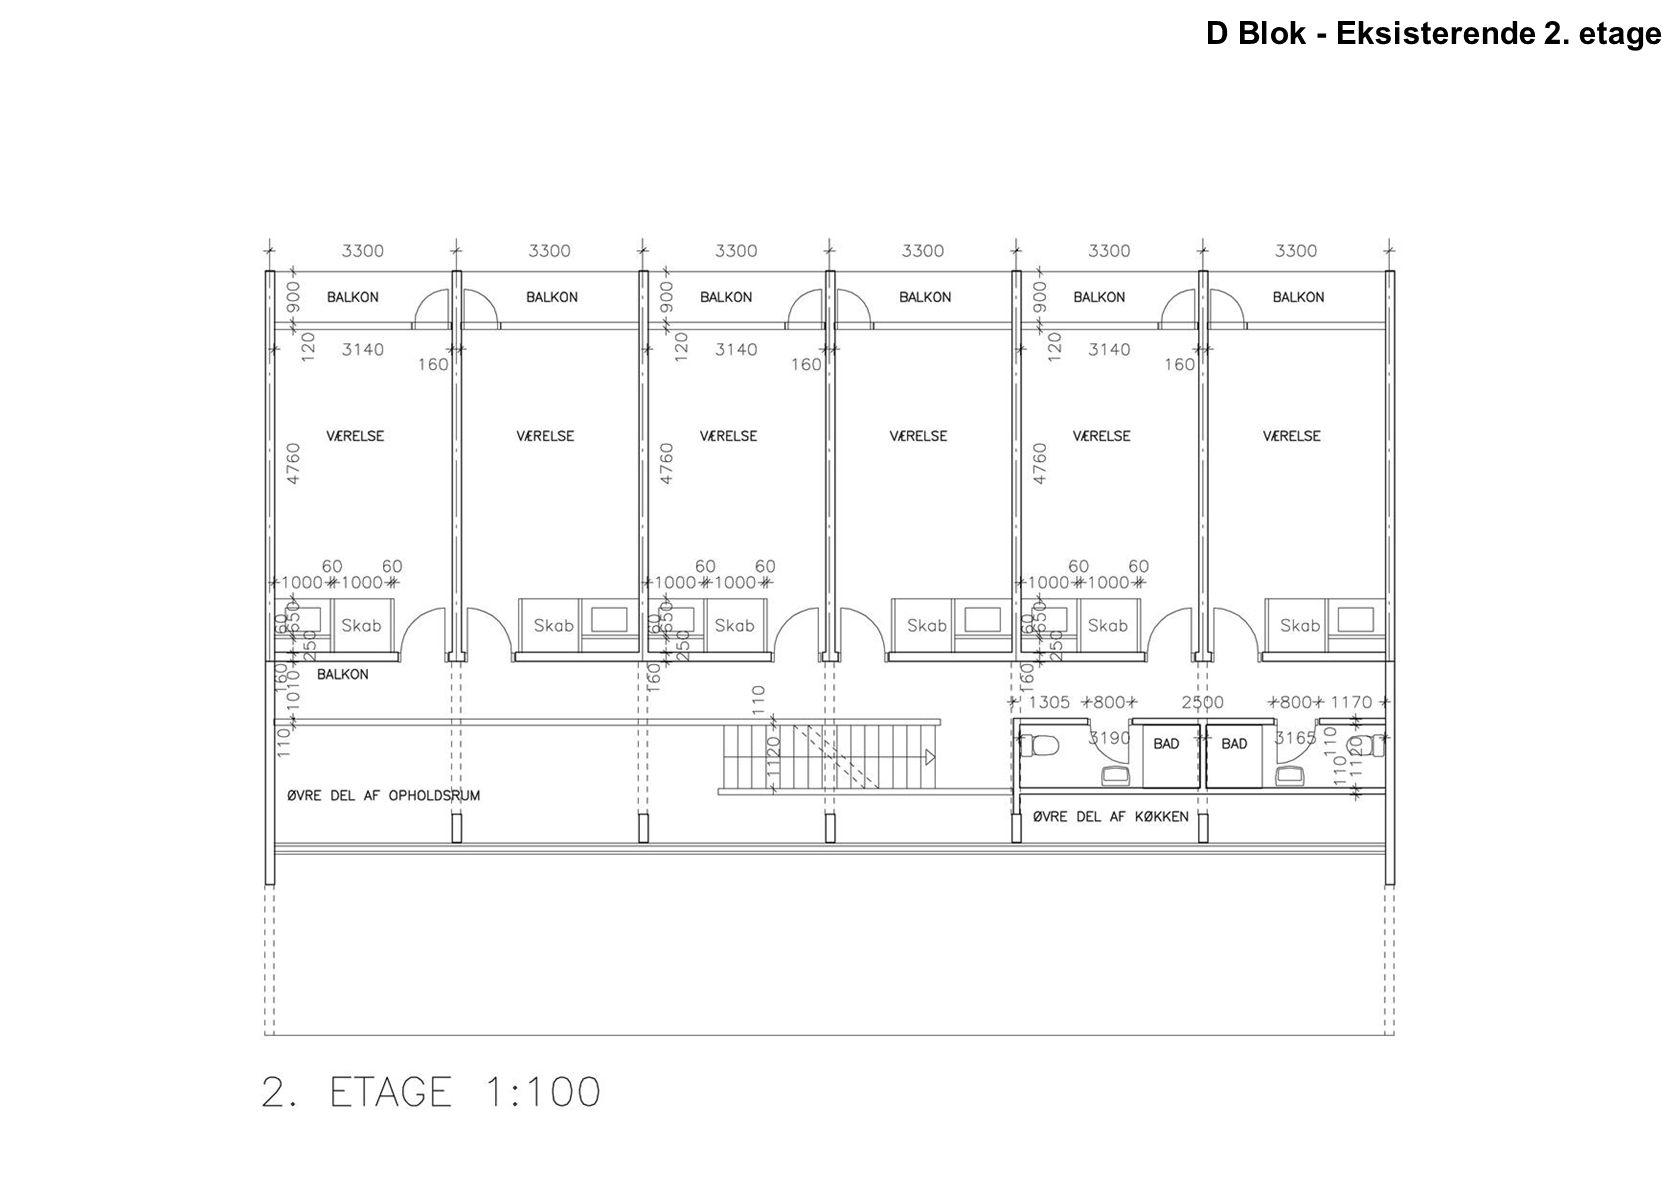 D Blok - Eksisterende 2. etage